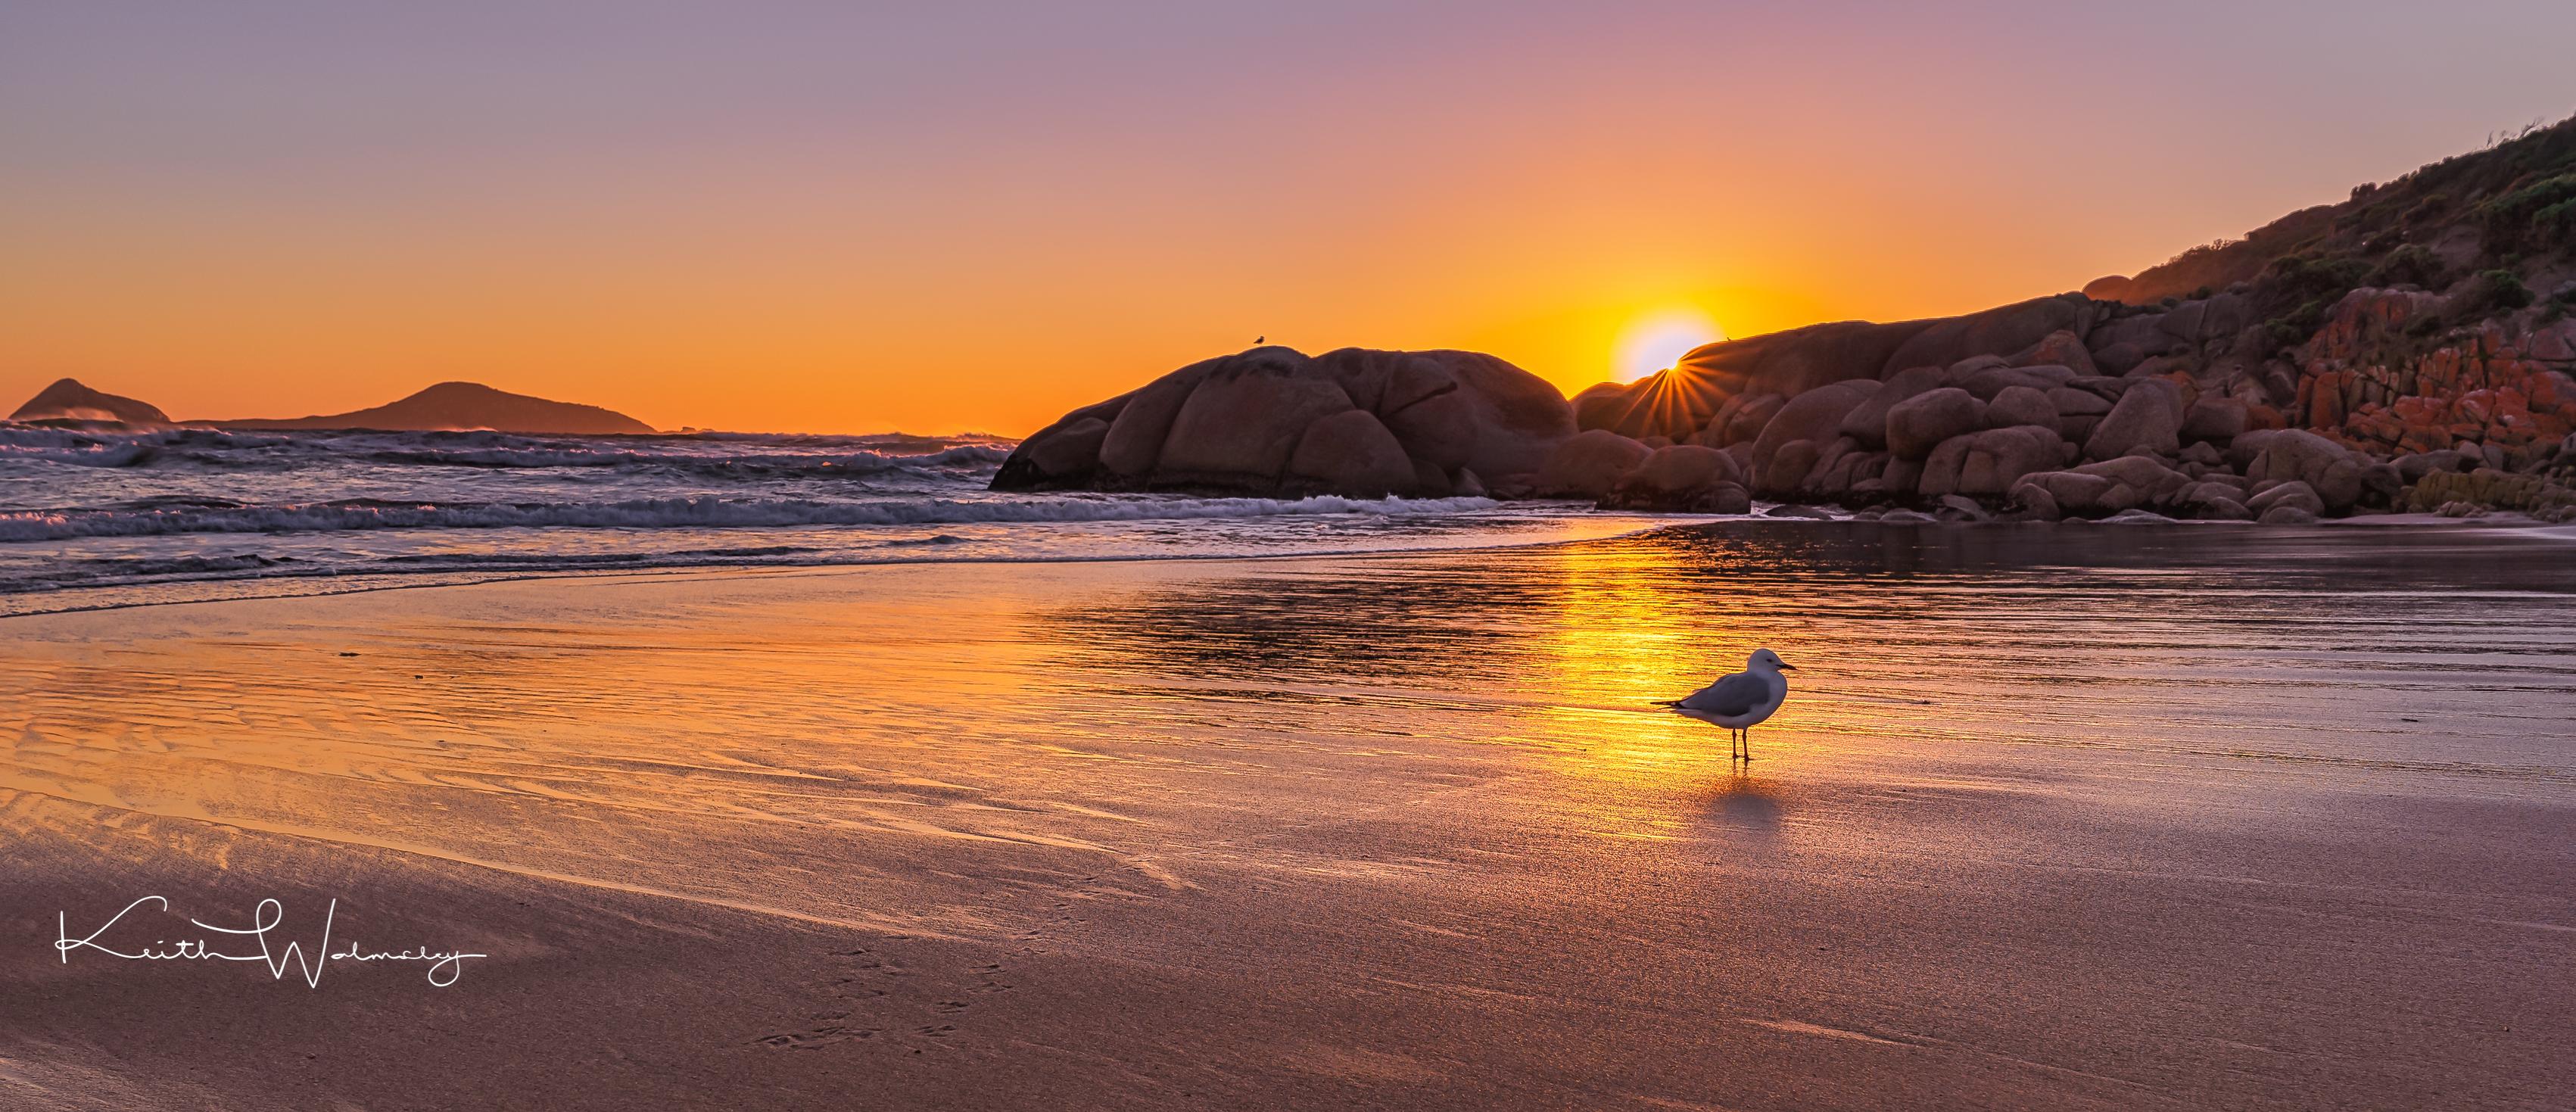 Sea Gull Sunset